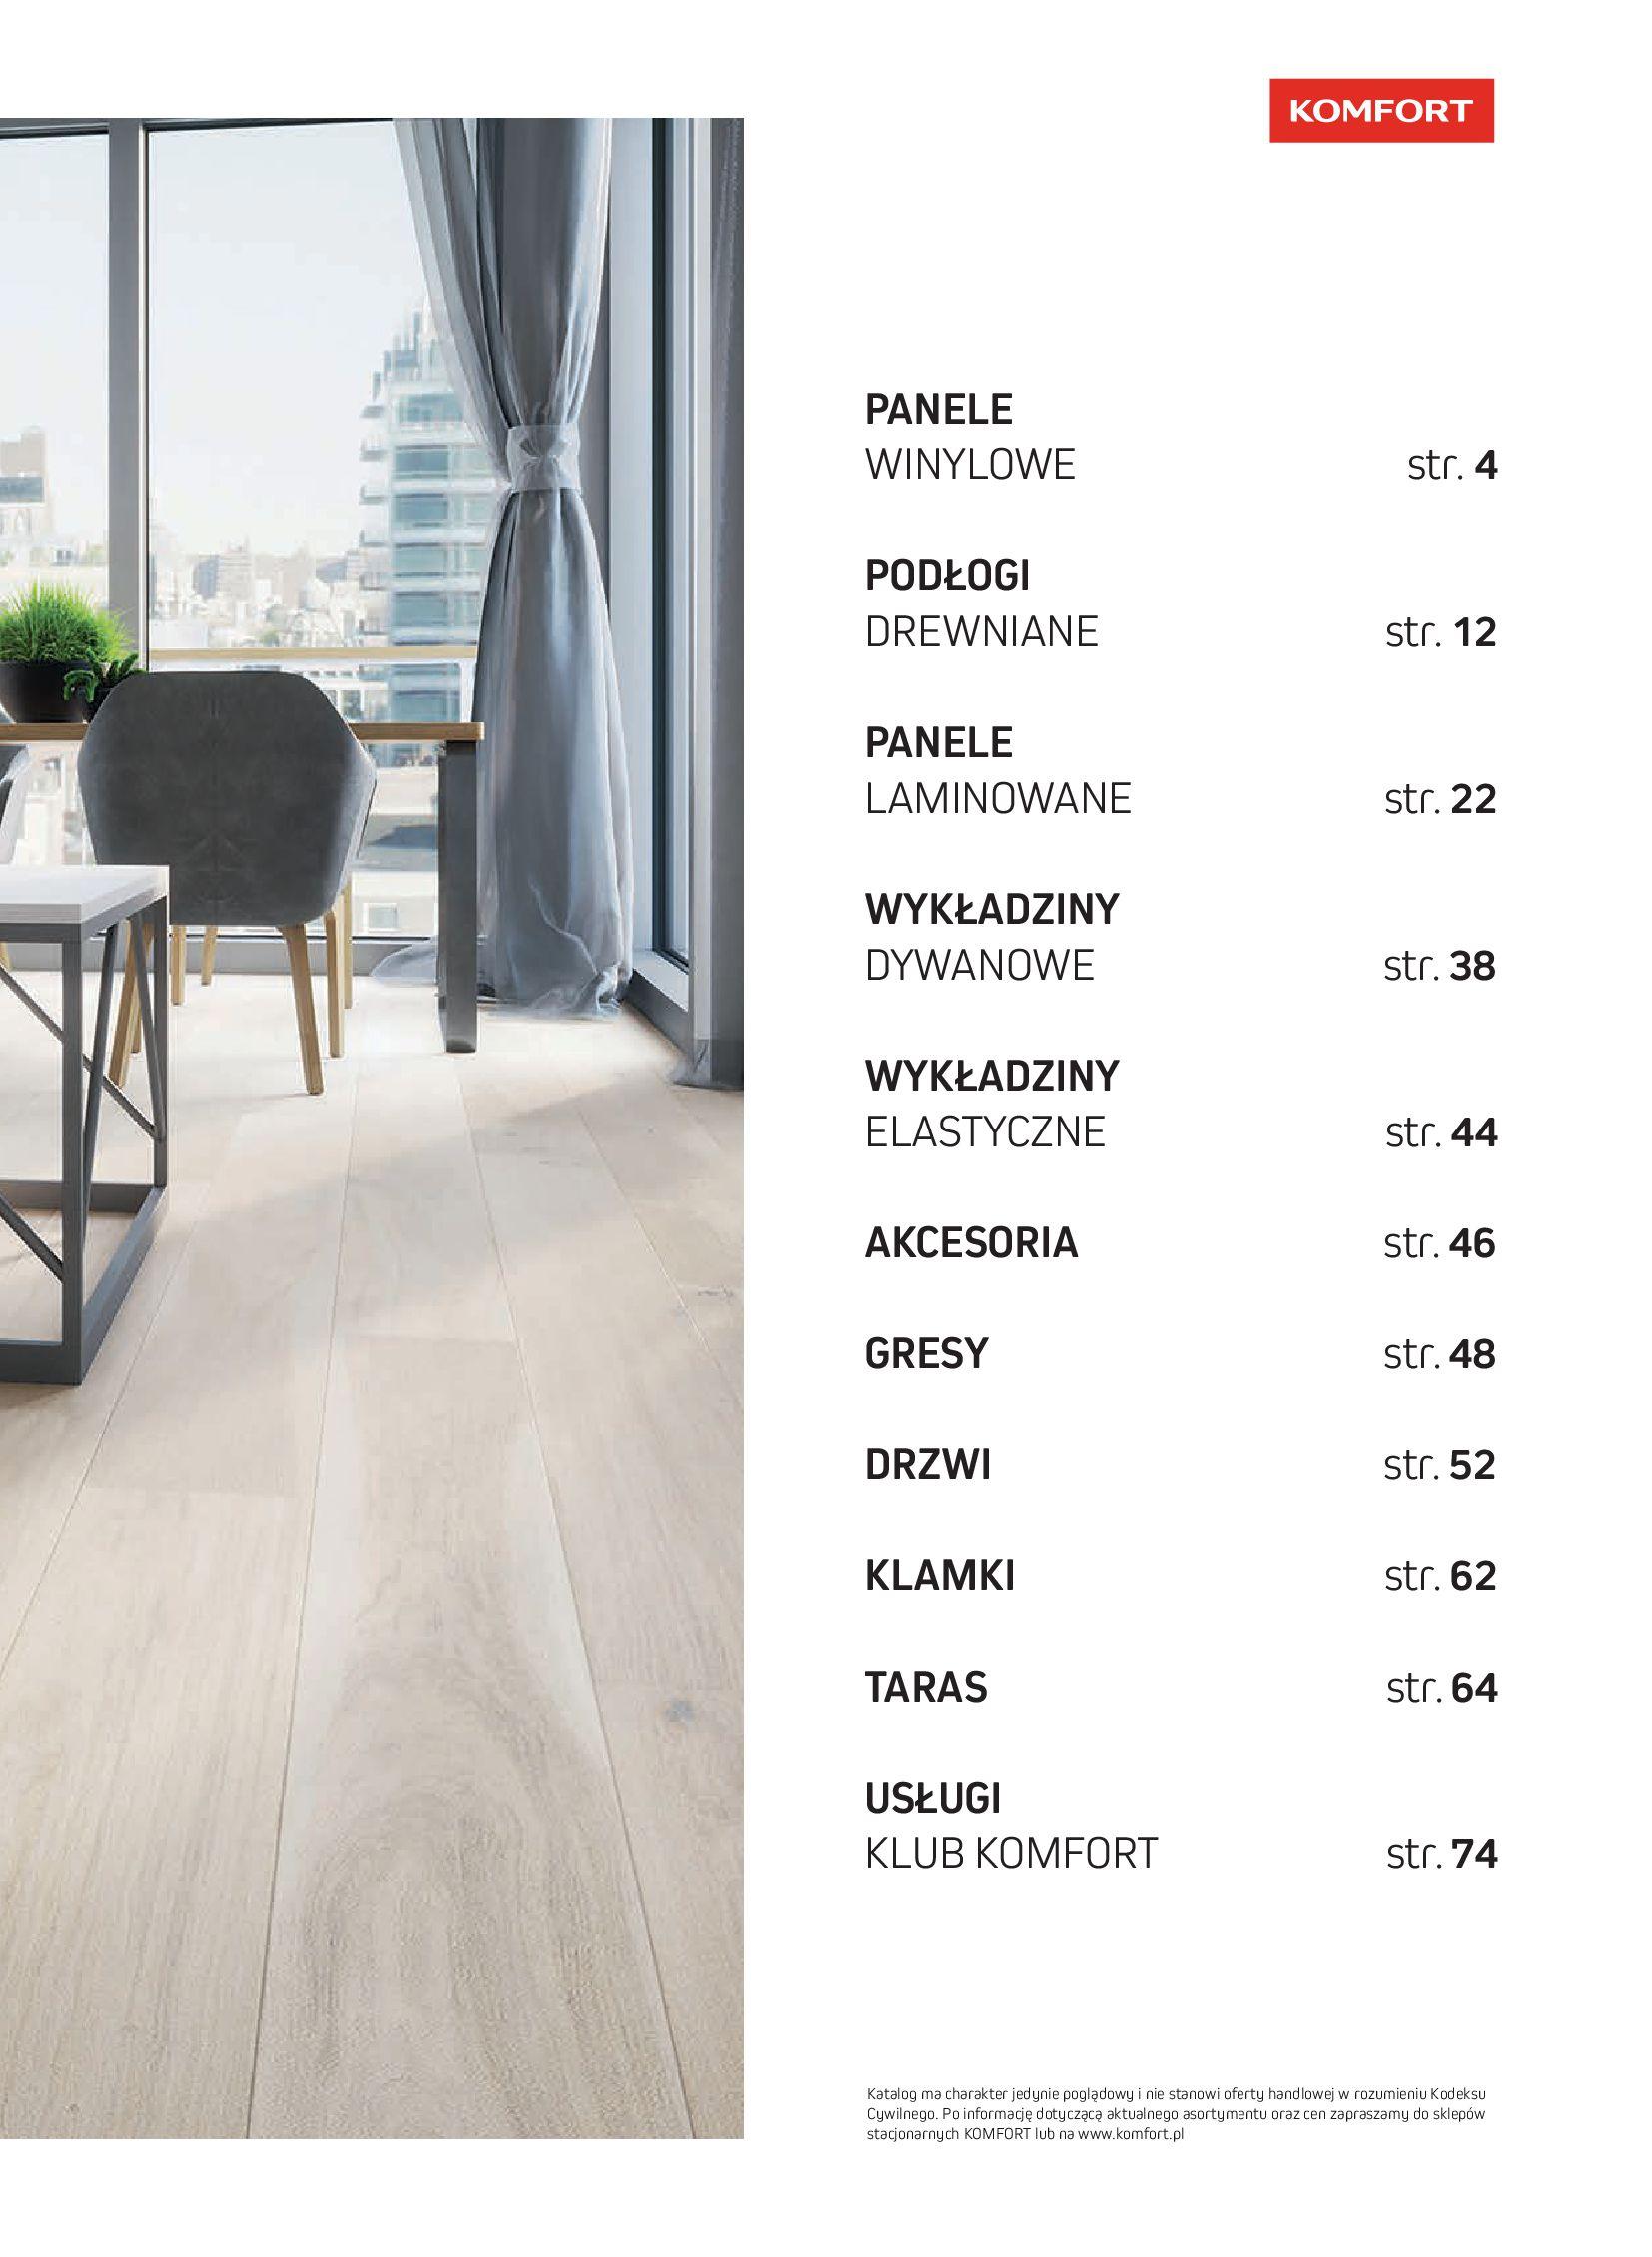 Gazetka Komfort: Gazetka Komfort - Katalog podłogi i drzwi 2021-06-16 page-3